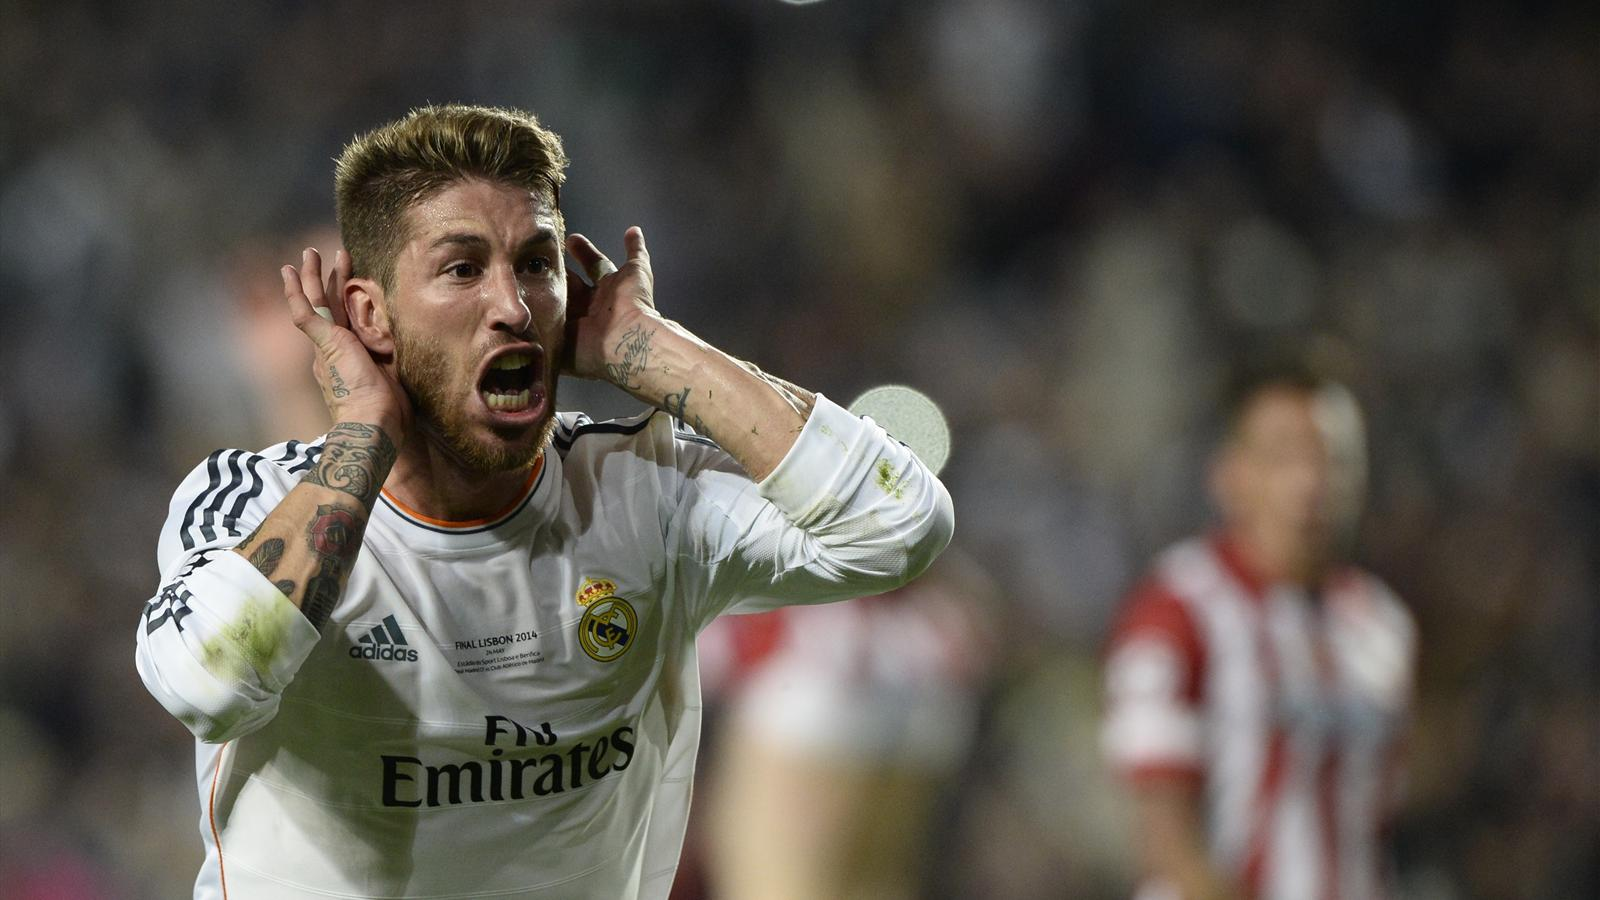 Sergio Ramos, celui qui ne s'est jamais caché